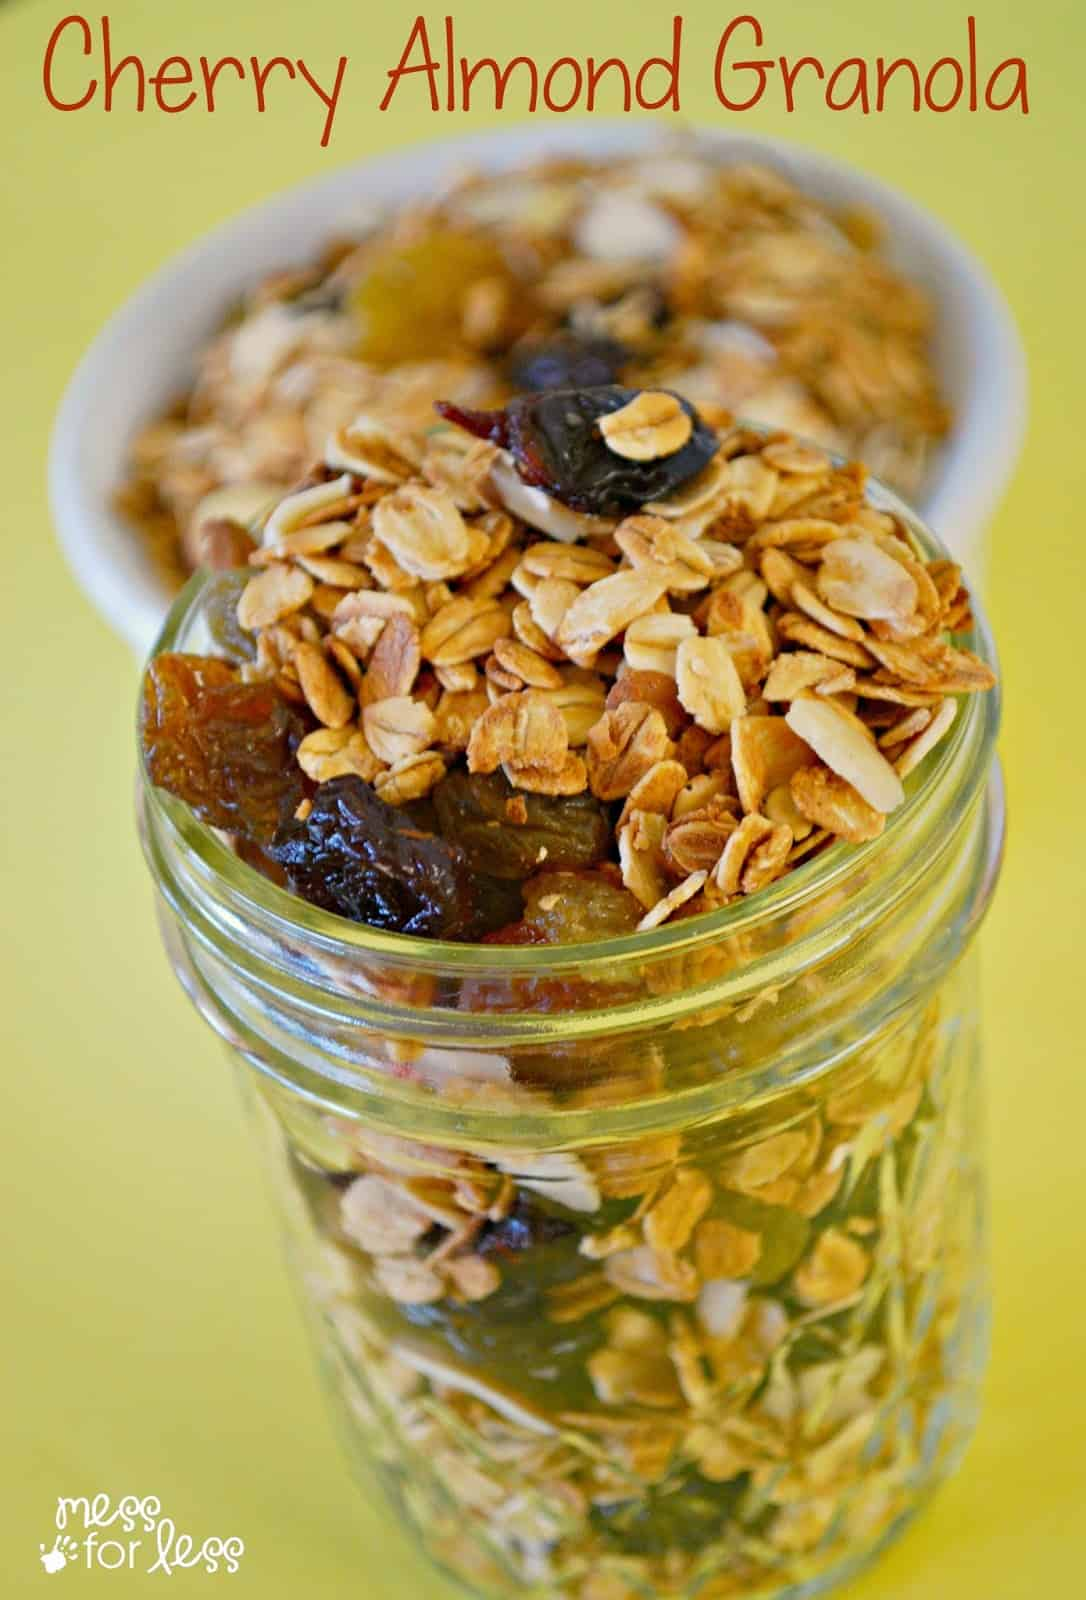 Cherry Almond Granola Recipe - this healthy granola recipe uses just a ...